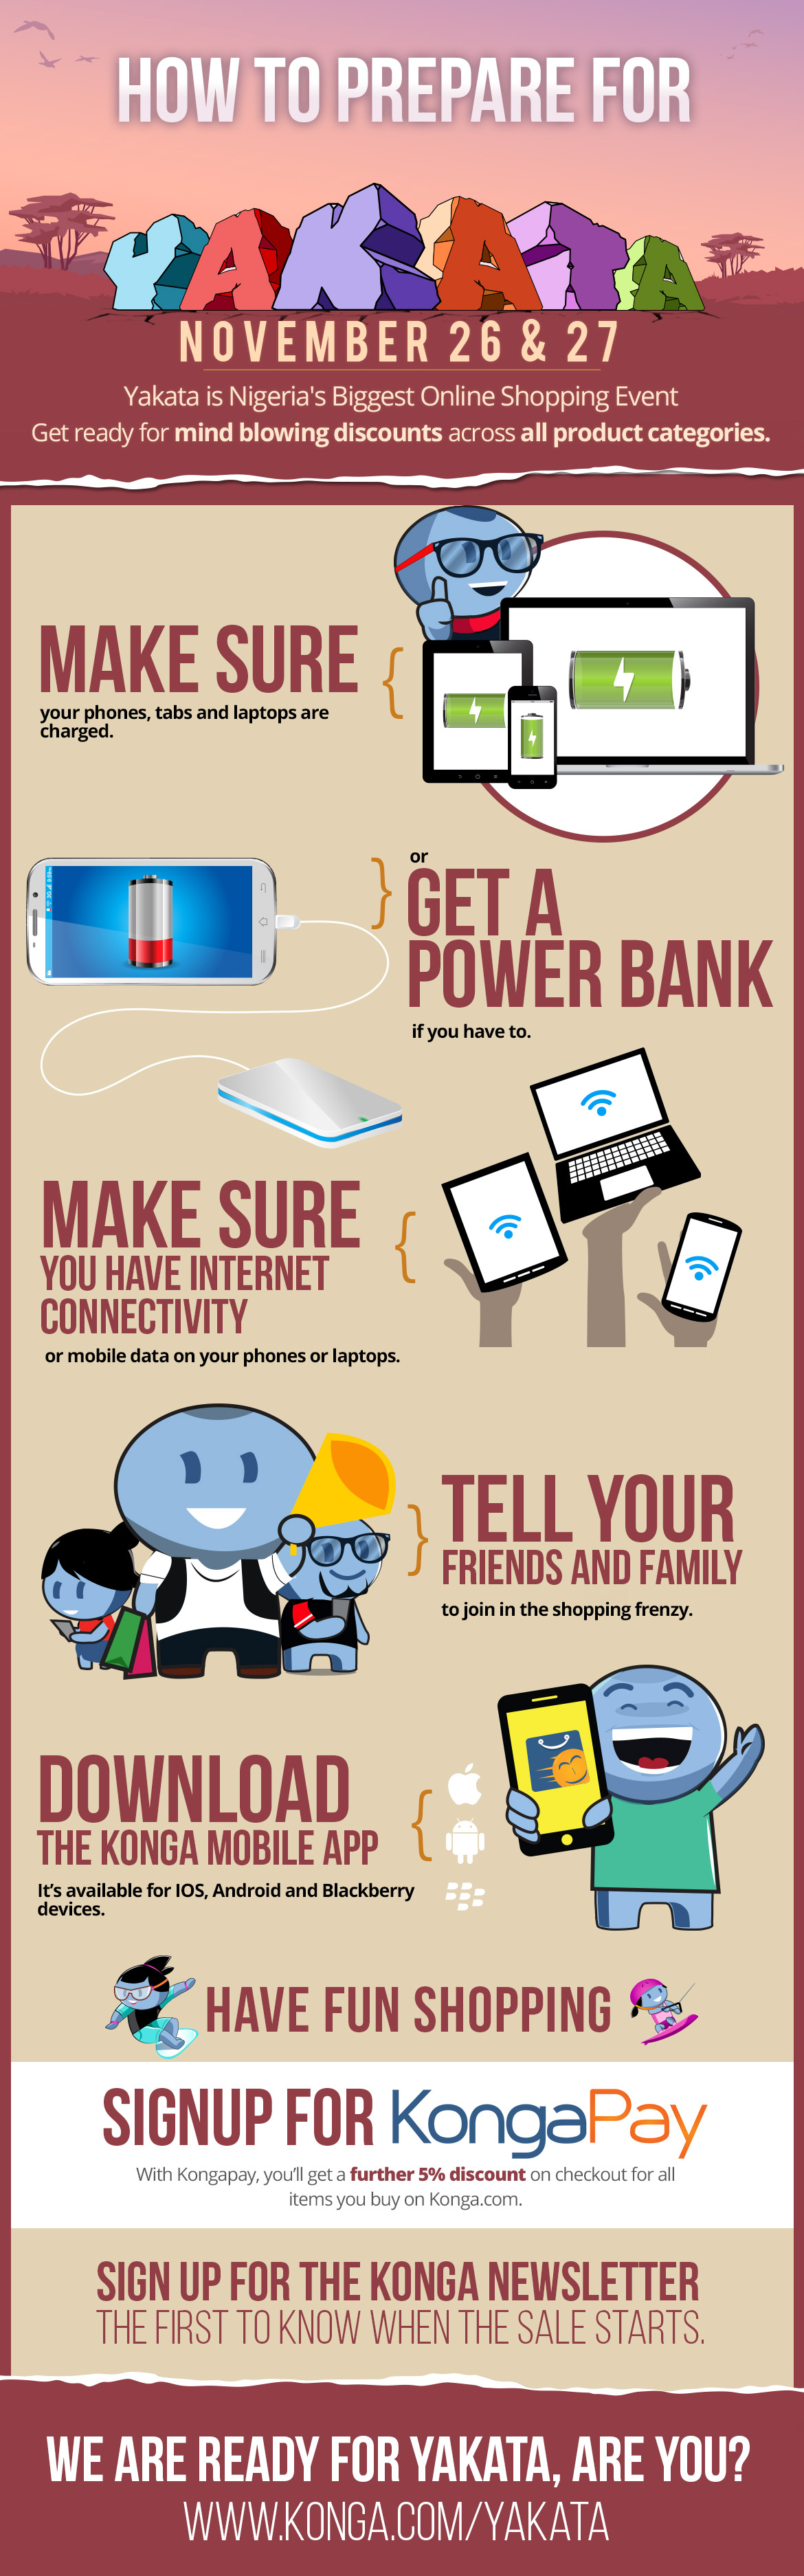 Infographic: How to Prepare for Konga #Yakata2015 Sales